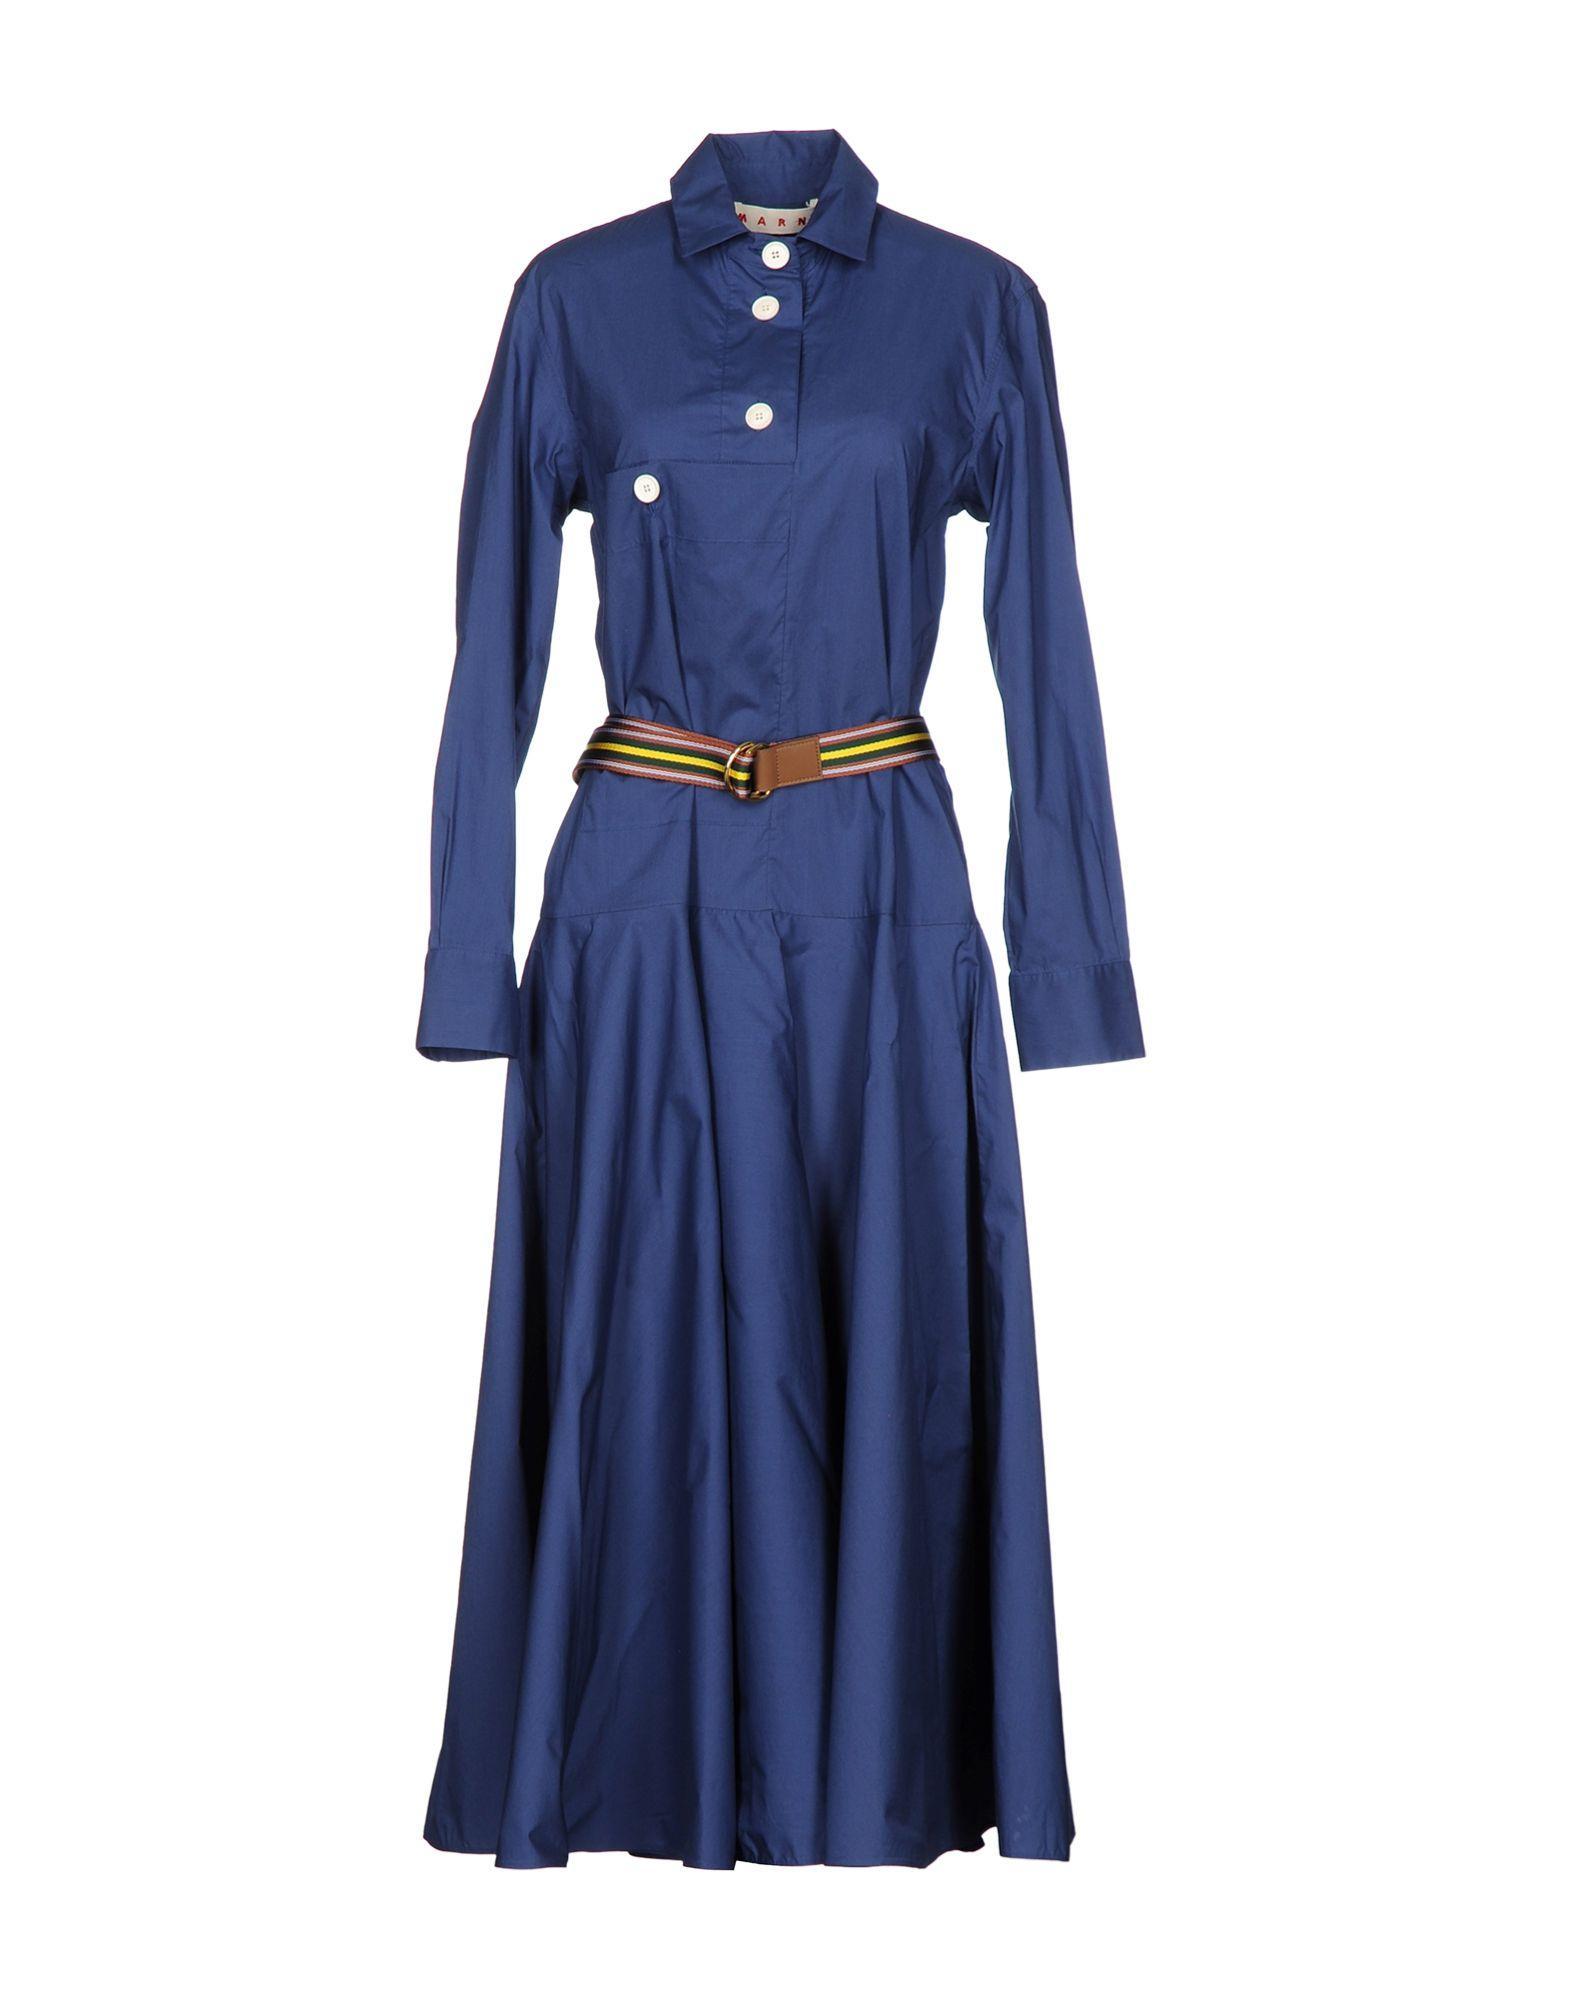 Marni 3/4 Length Dress In Blue